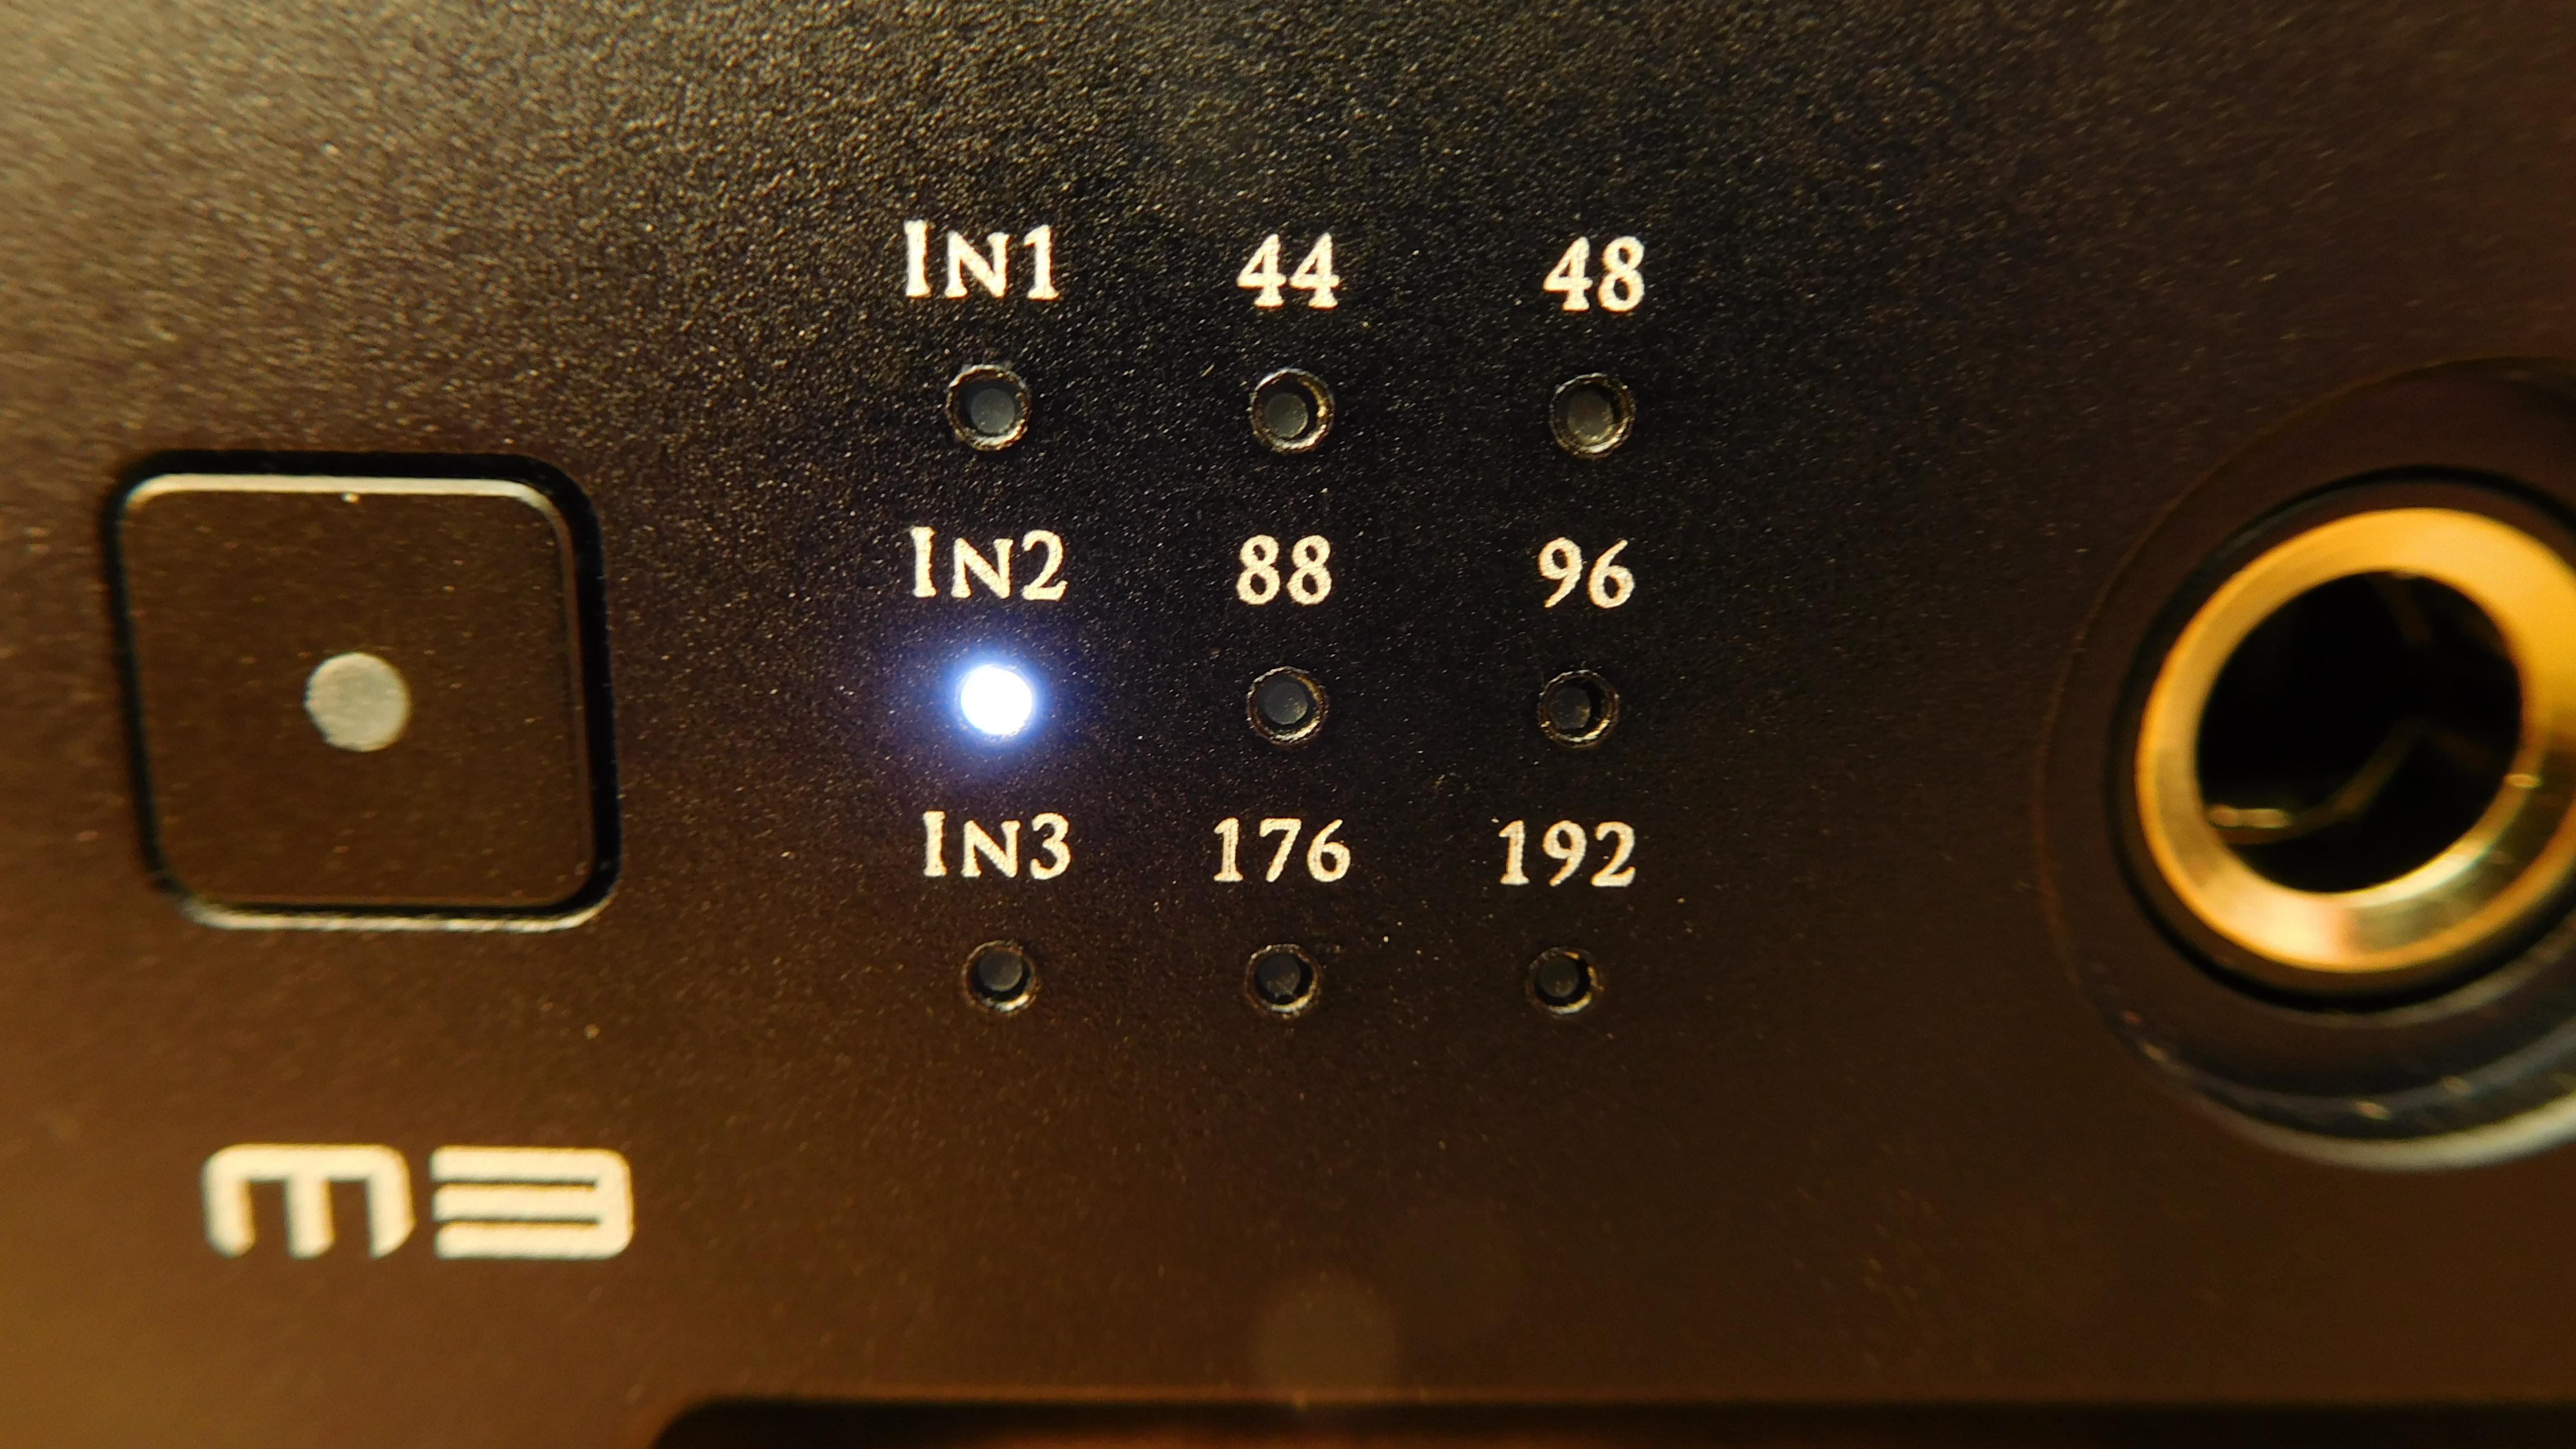 Impression] S M S L M3 Mini USB Powered Audio Decoder with